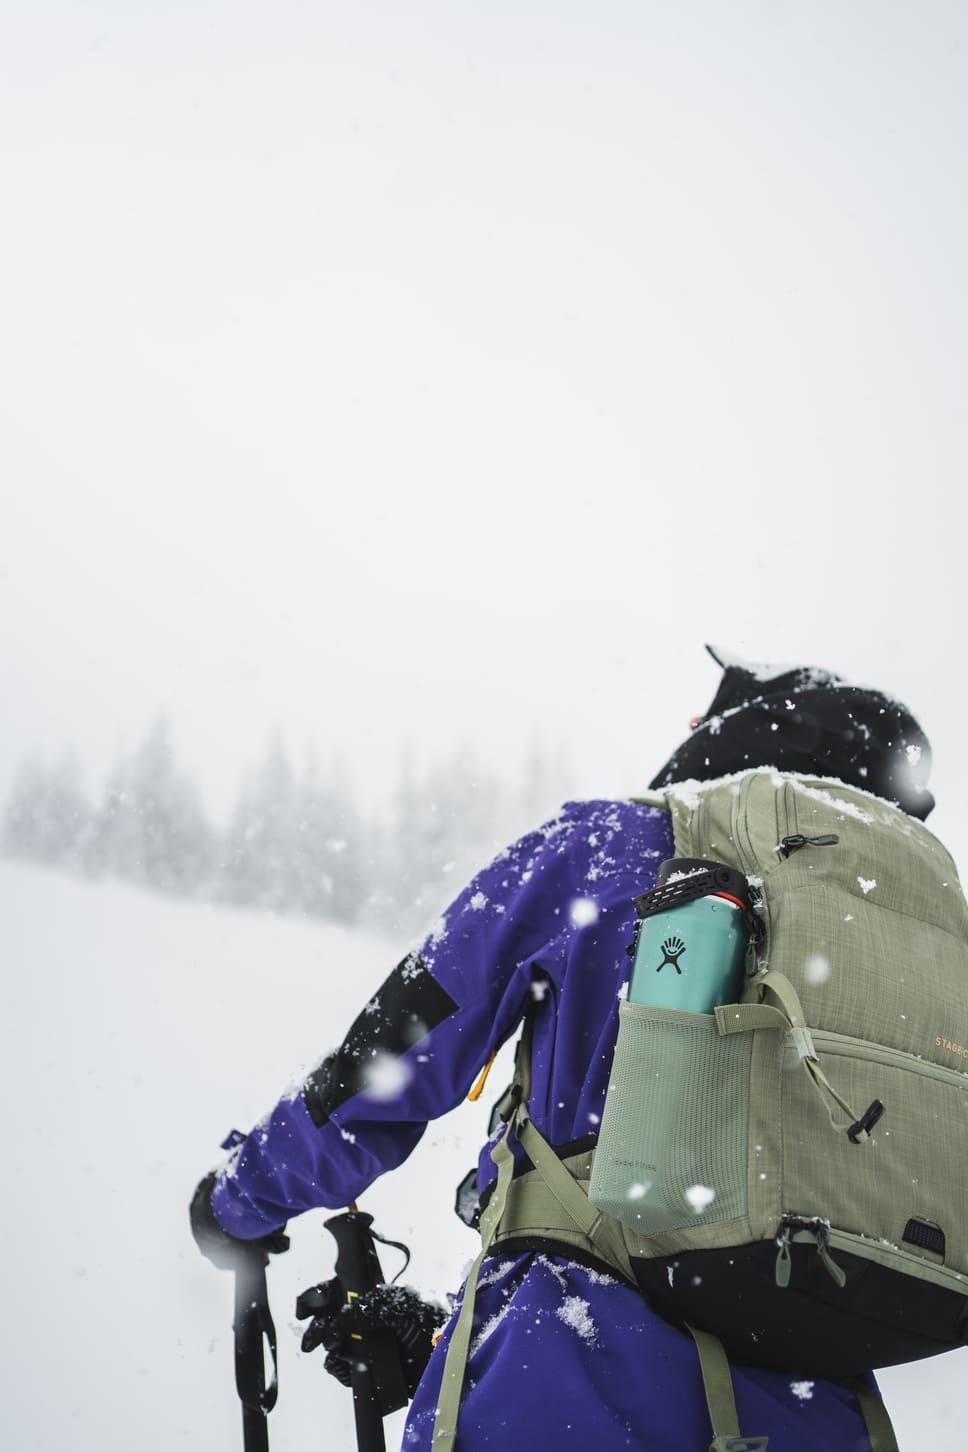 Frau im Neuschnee - Chris Gollhofer Lifestylefotografie